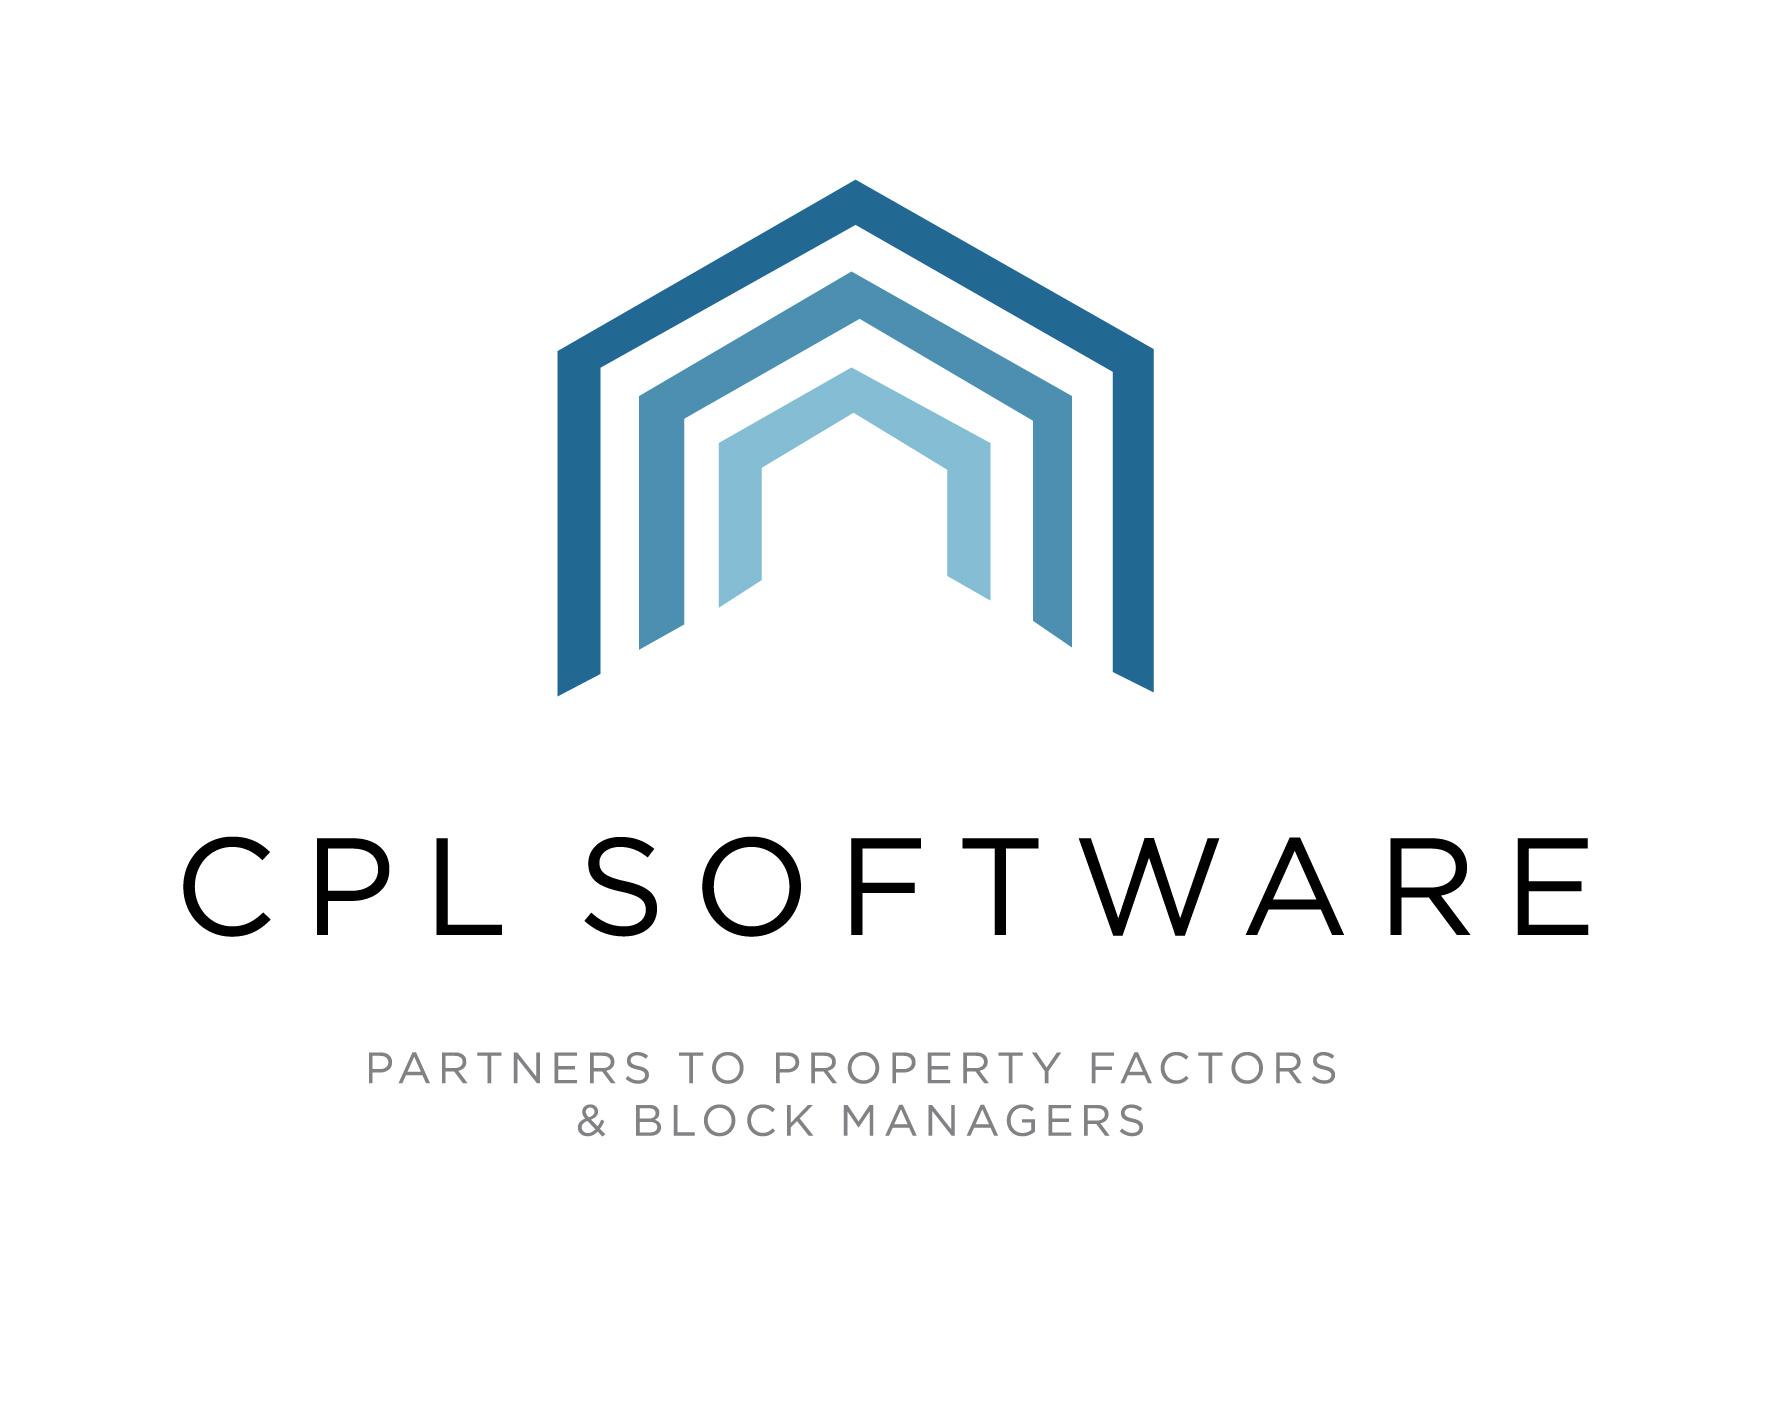 CPL Software Ltd